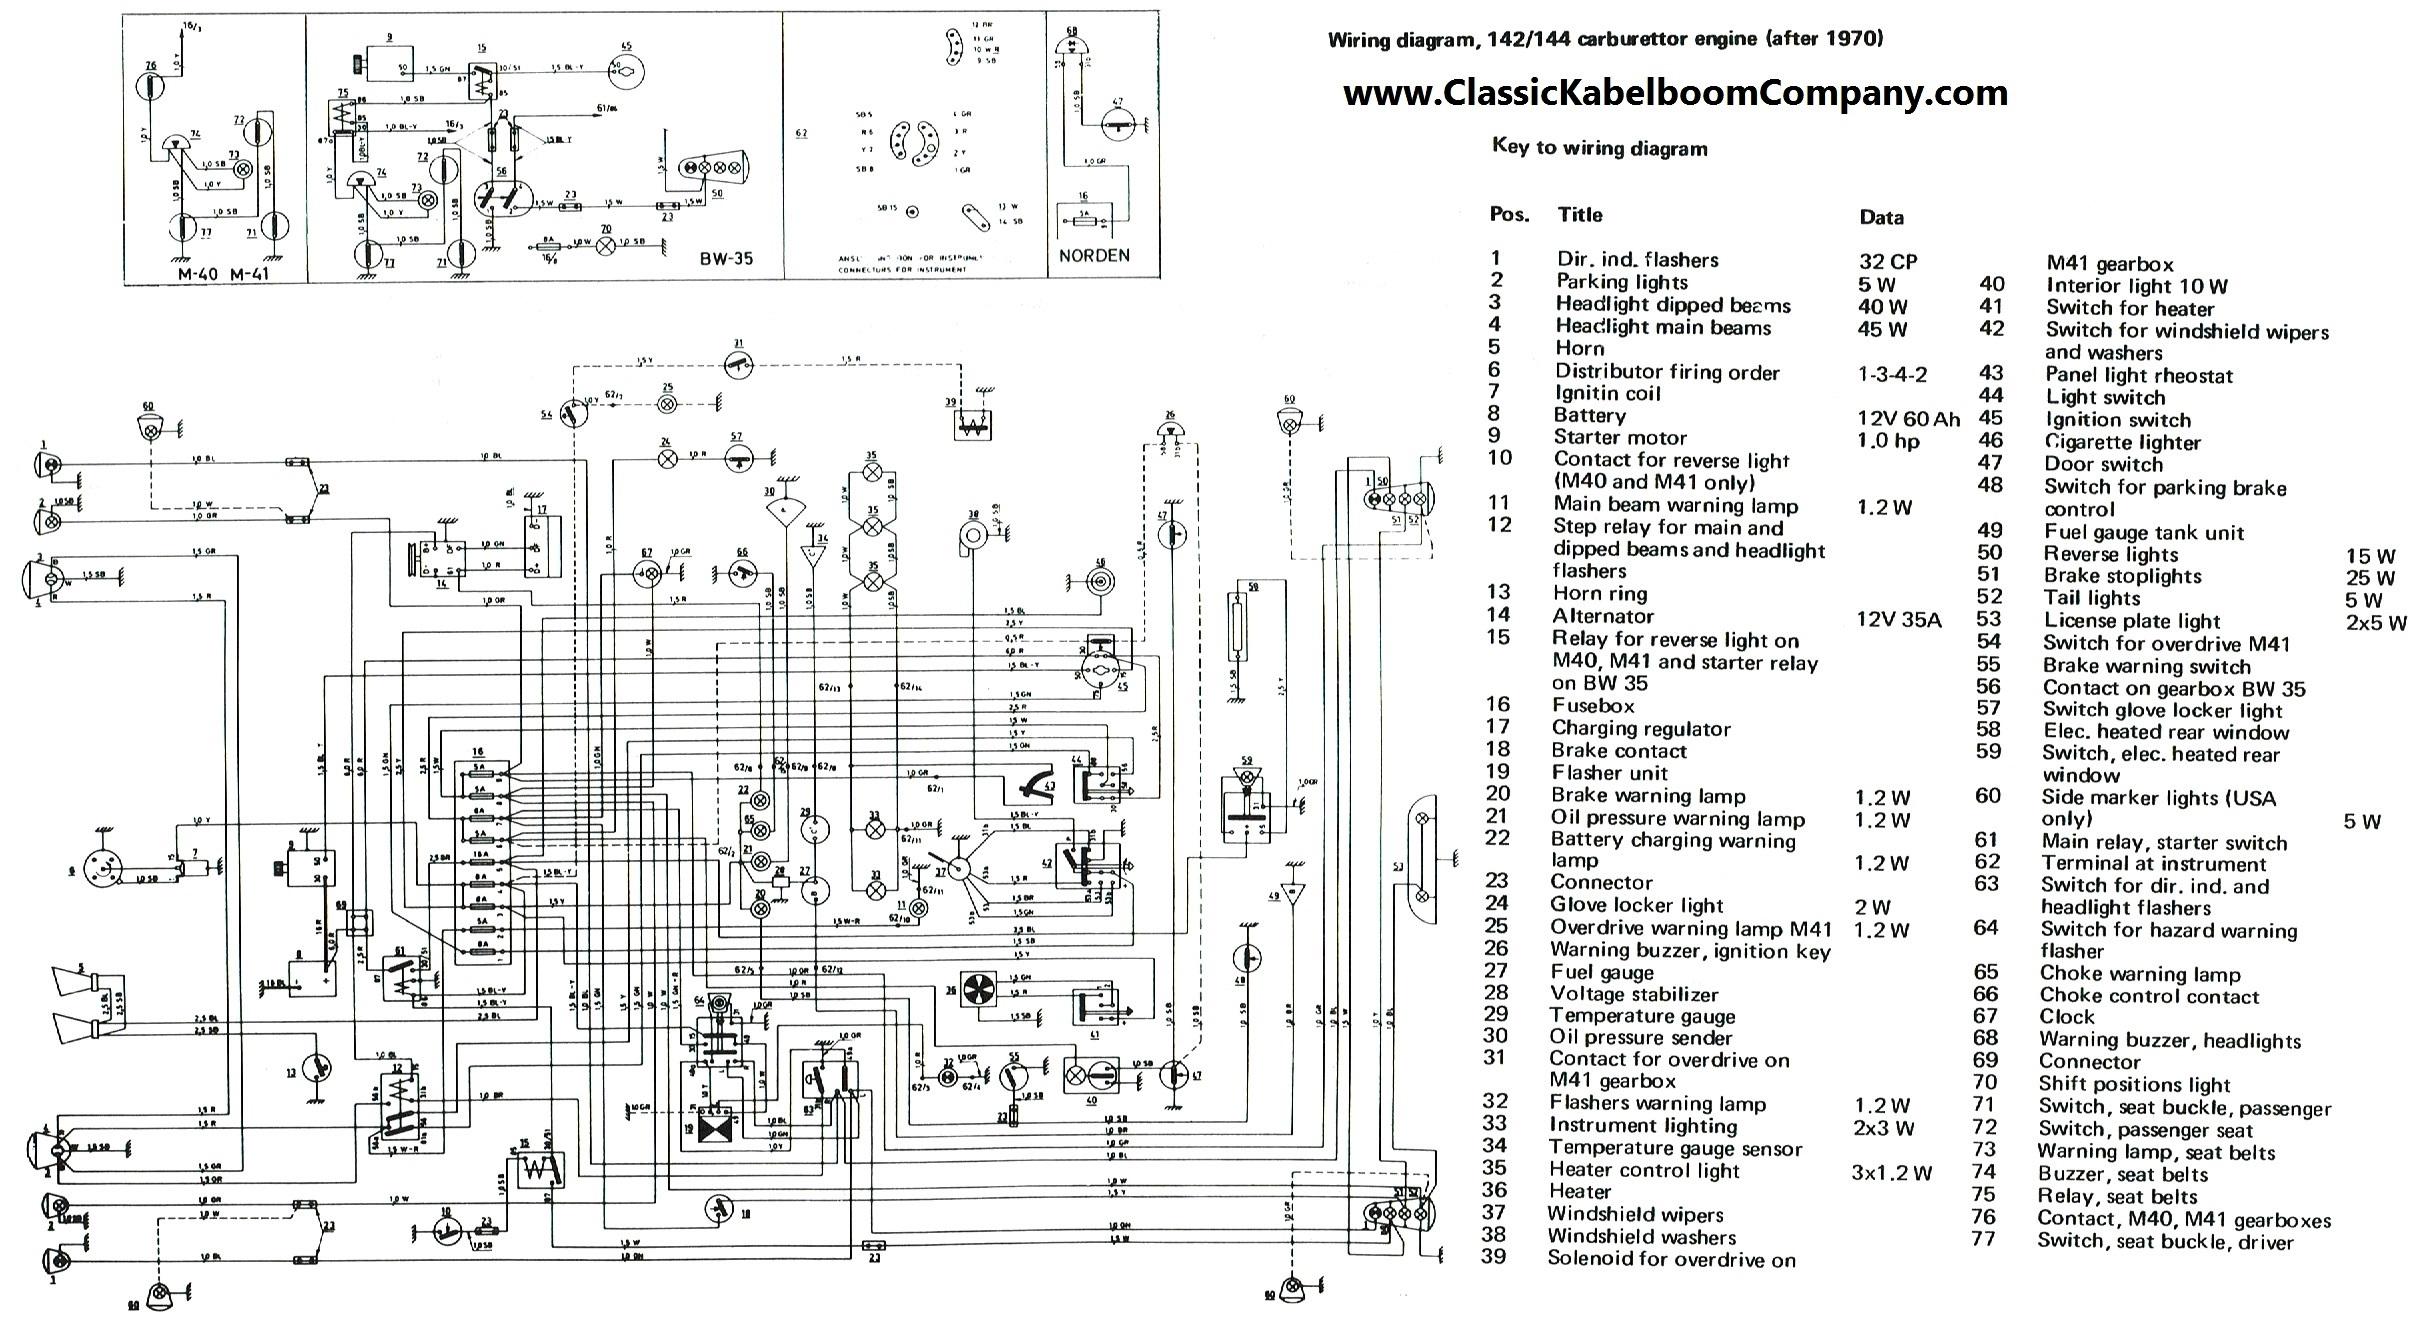 vol19?cdp=a classic kabelboom company elektrisch bedrading schema volvo 1973 Volvo 142 at reclaimingppi.co